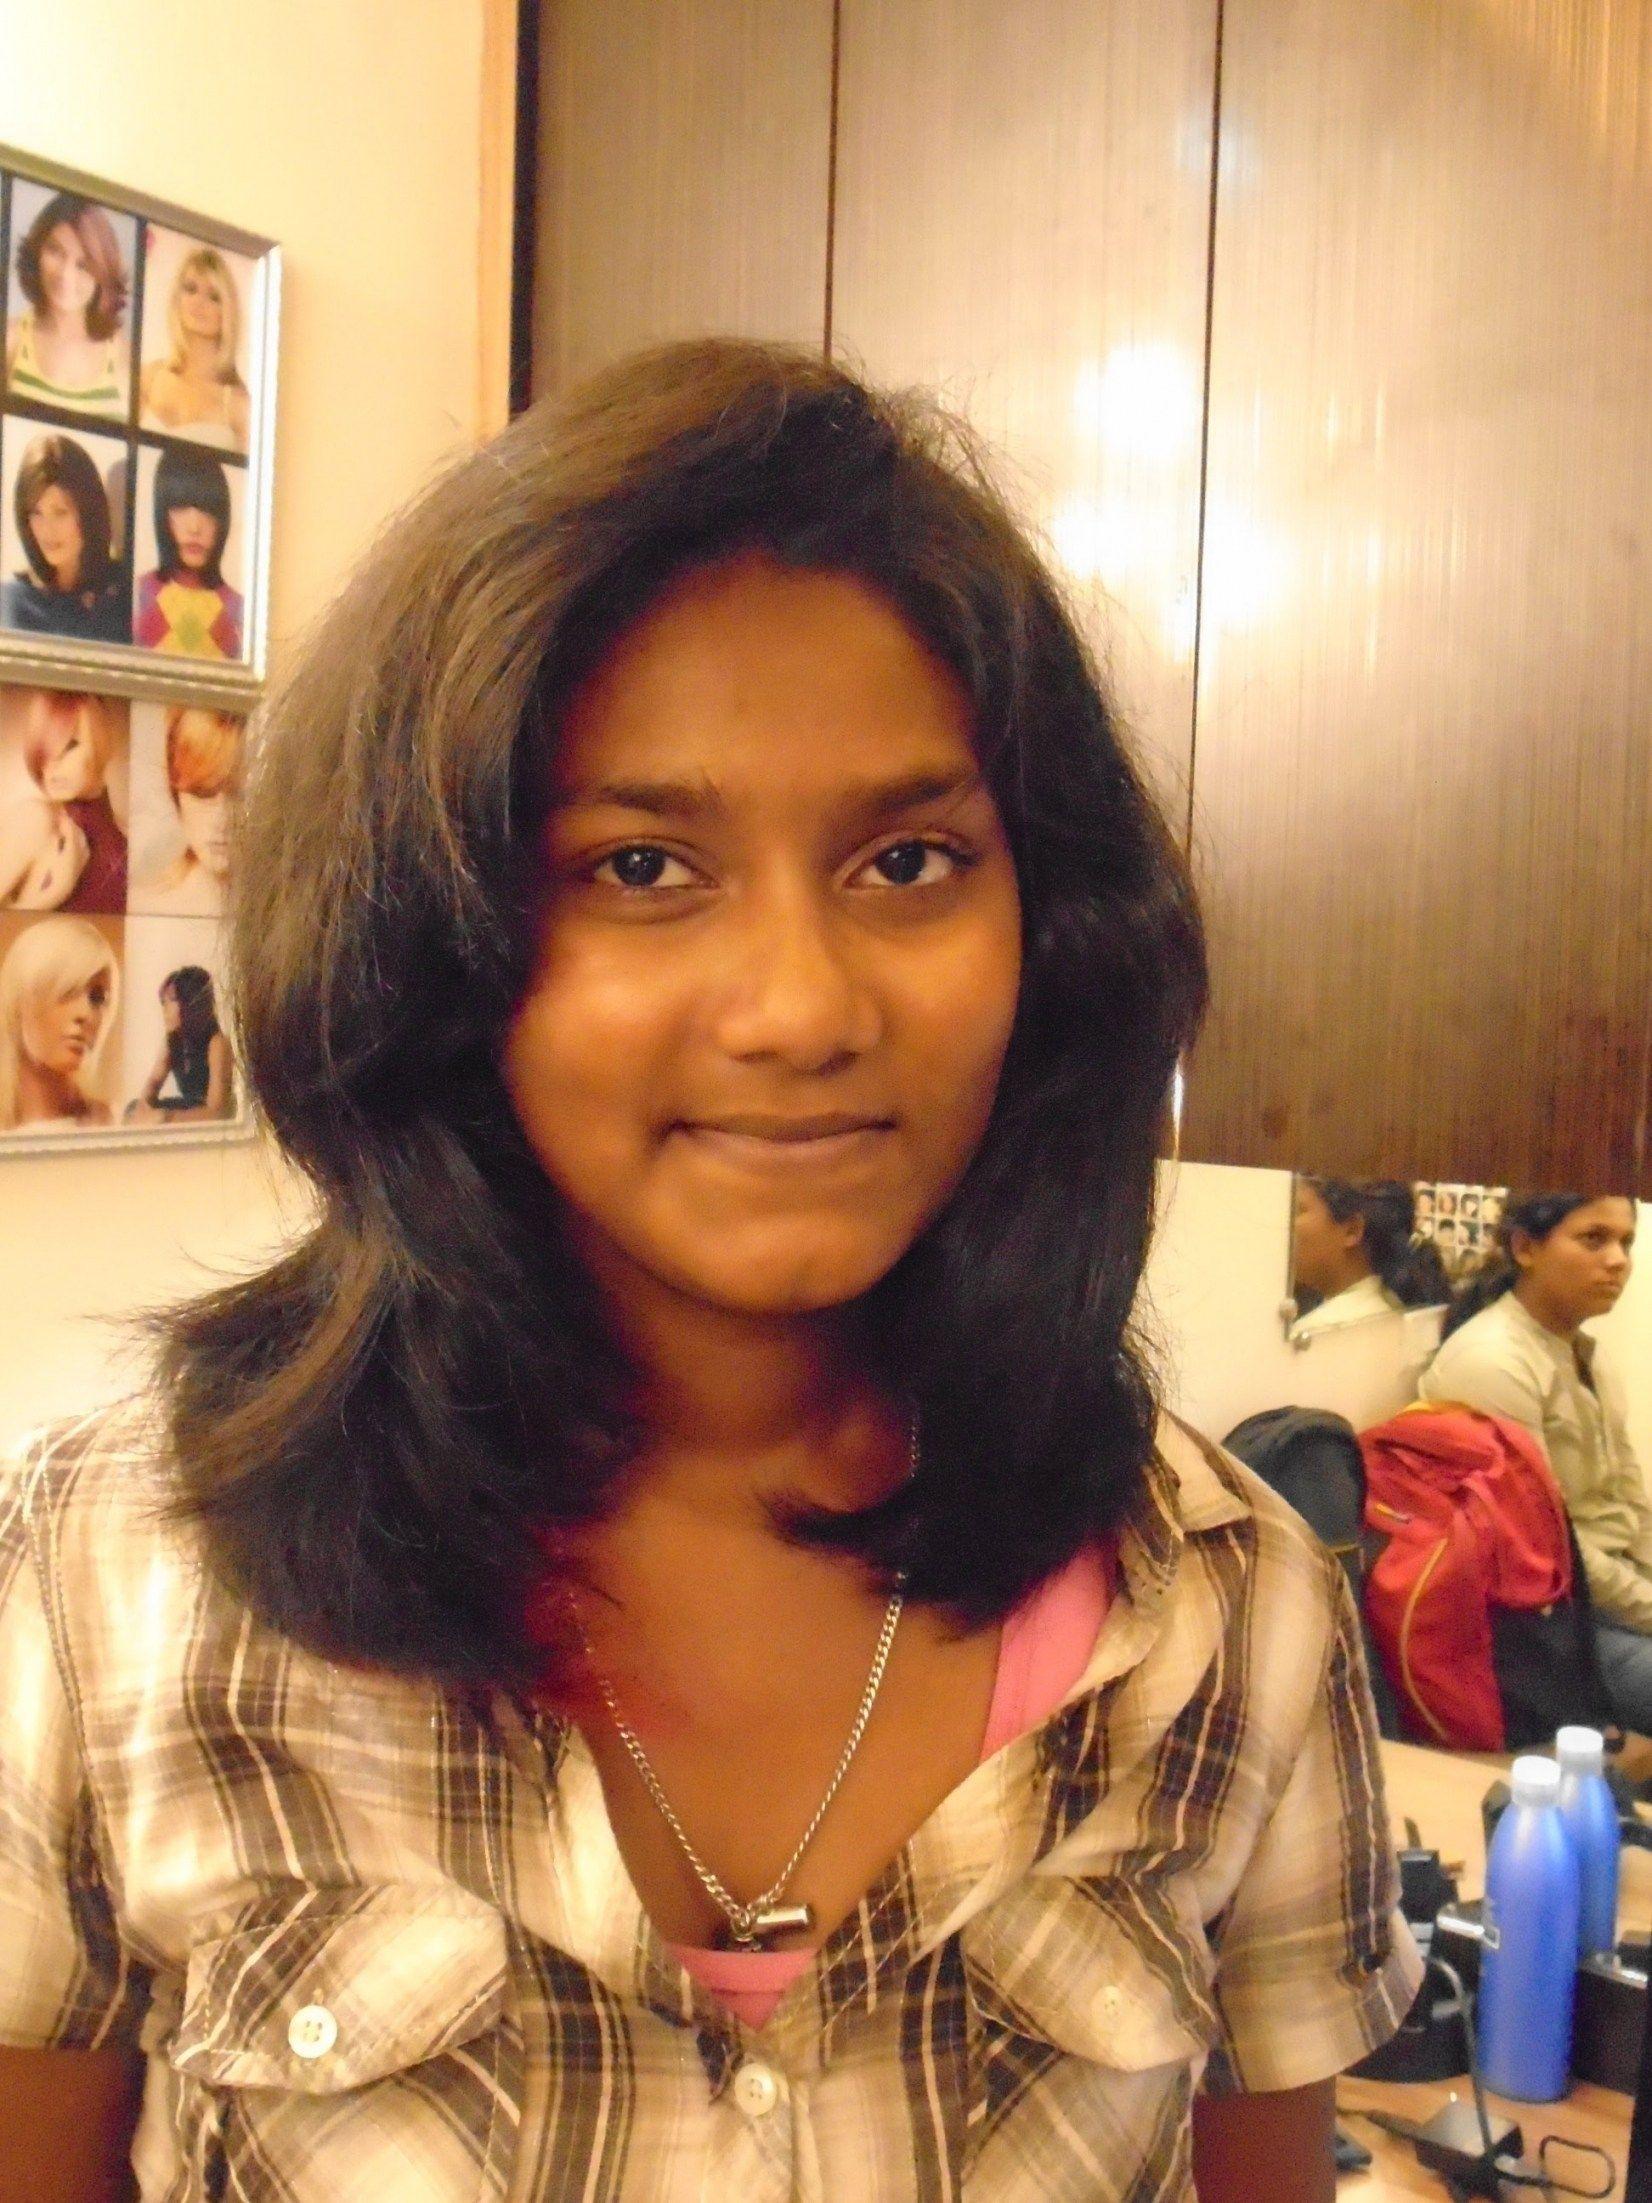 Layered Hair Cut Indian Hairstyles Ideas For Me Pinterest Hair